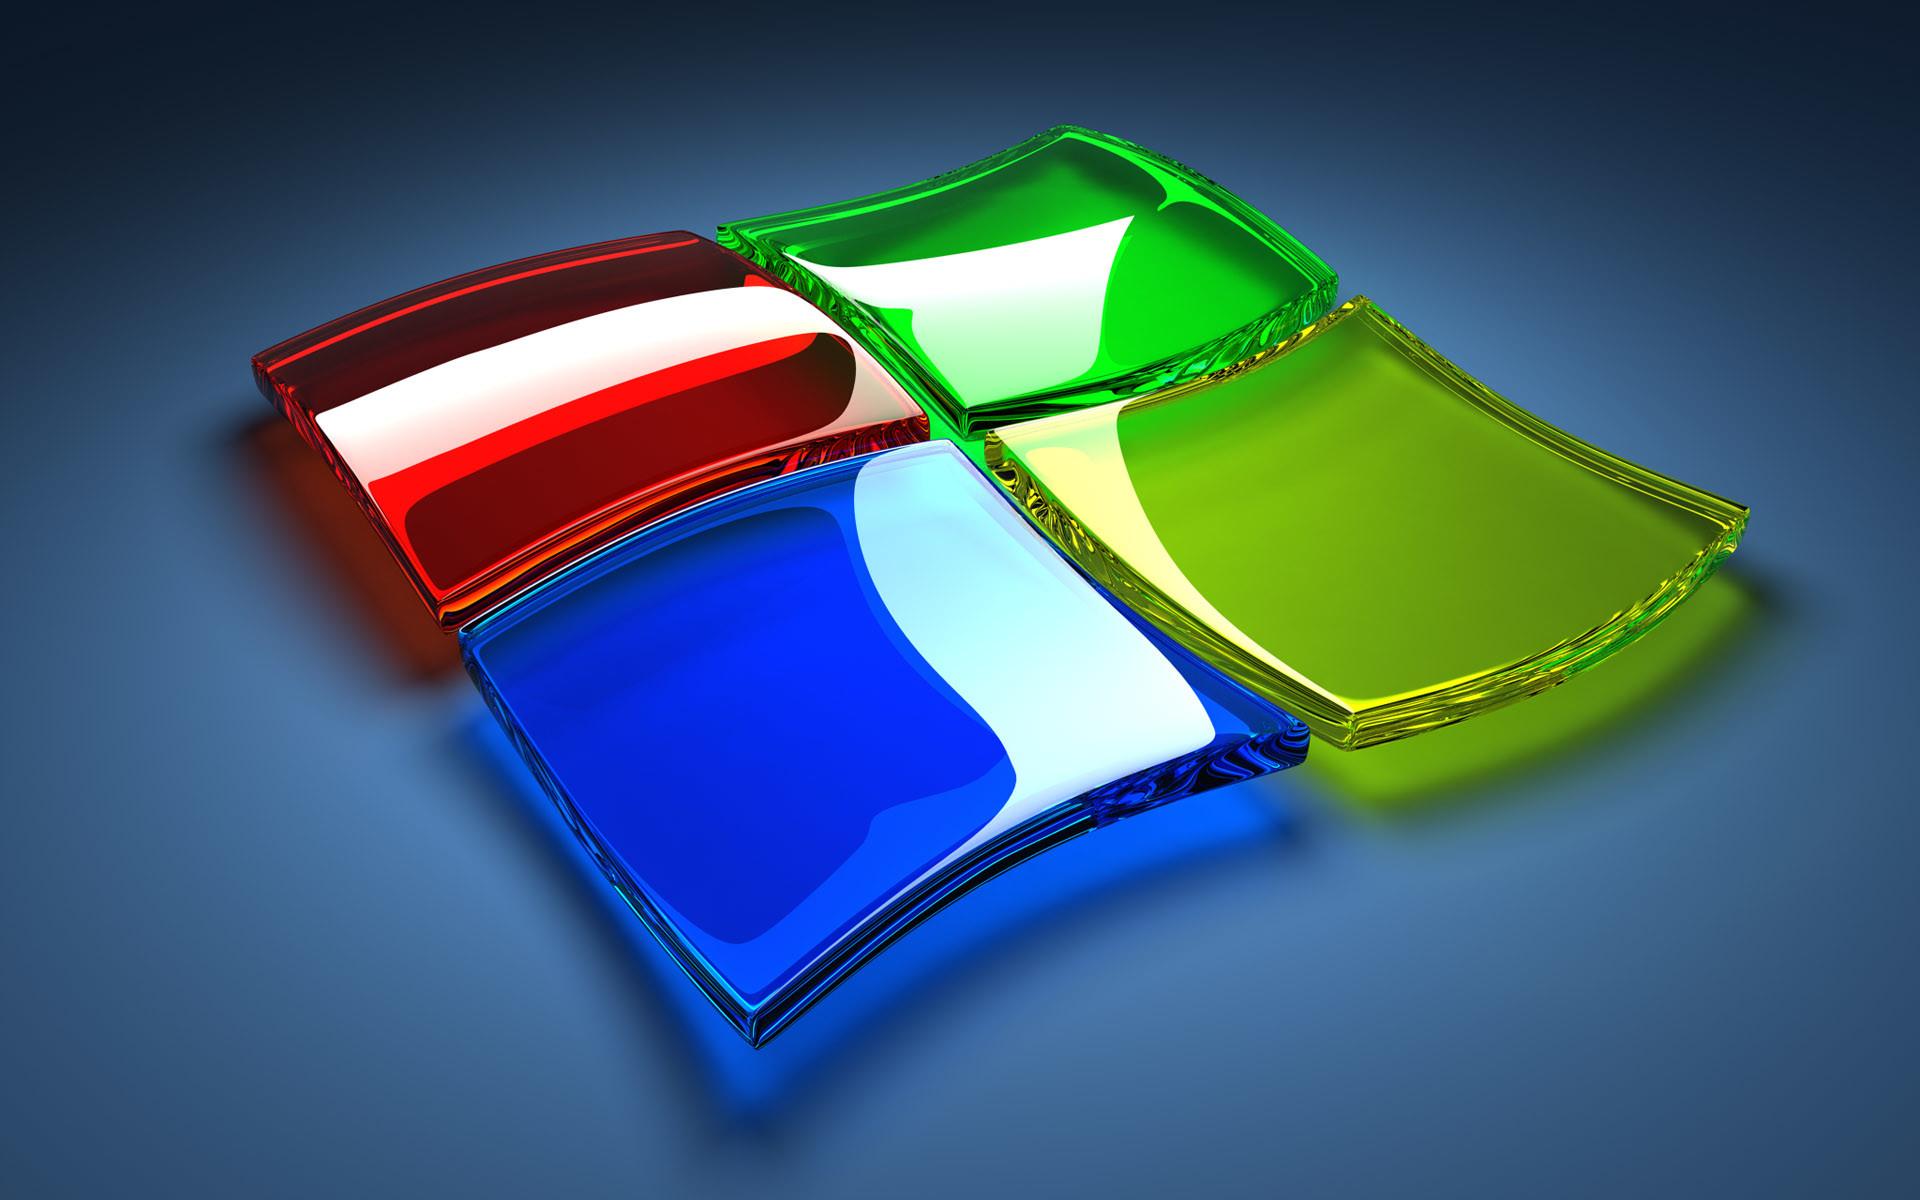 Desktop 3d wallpaper for windows 7